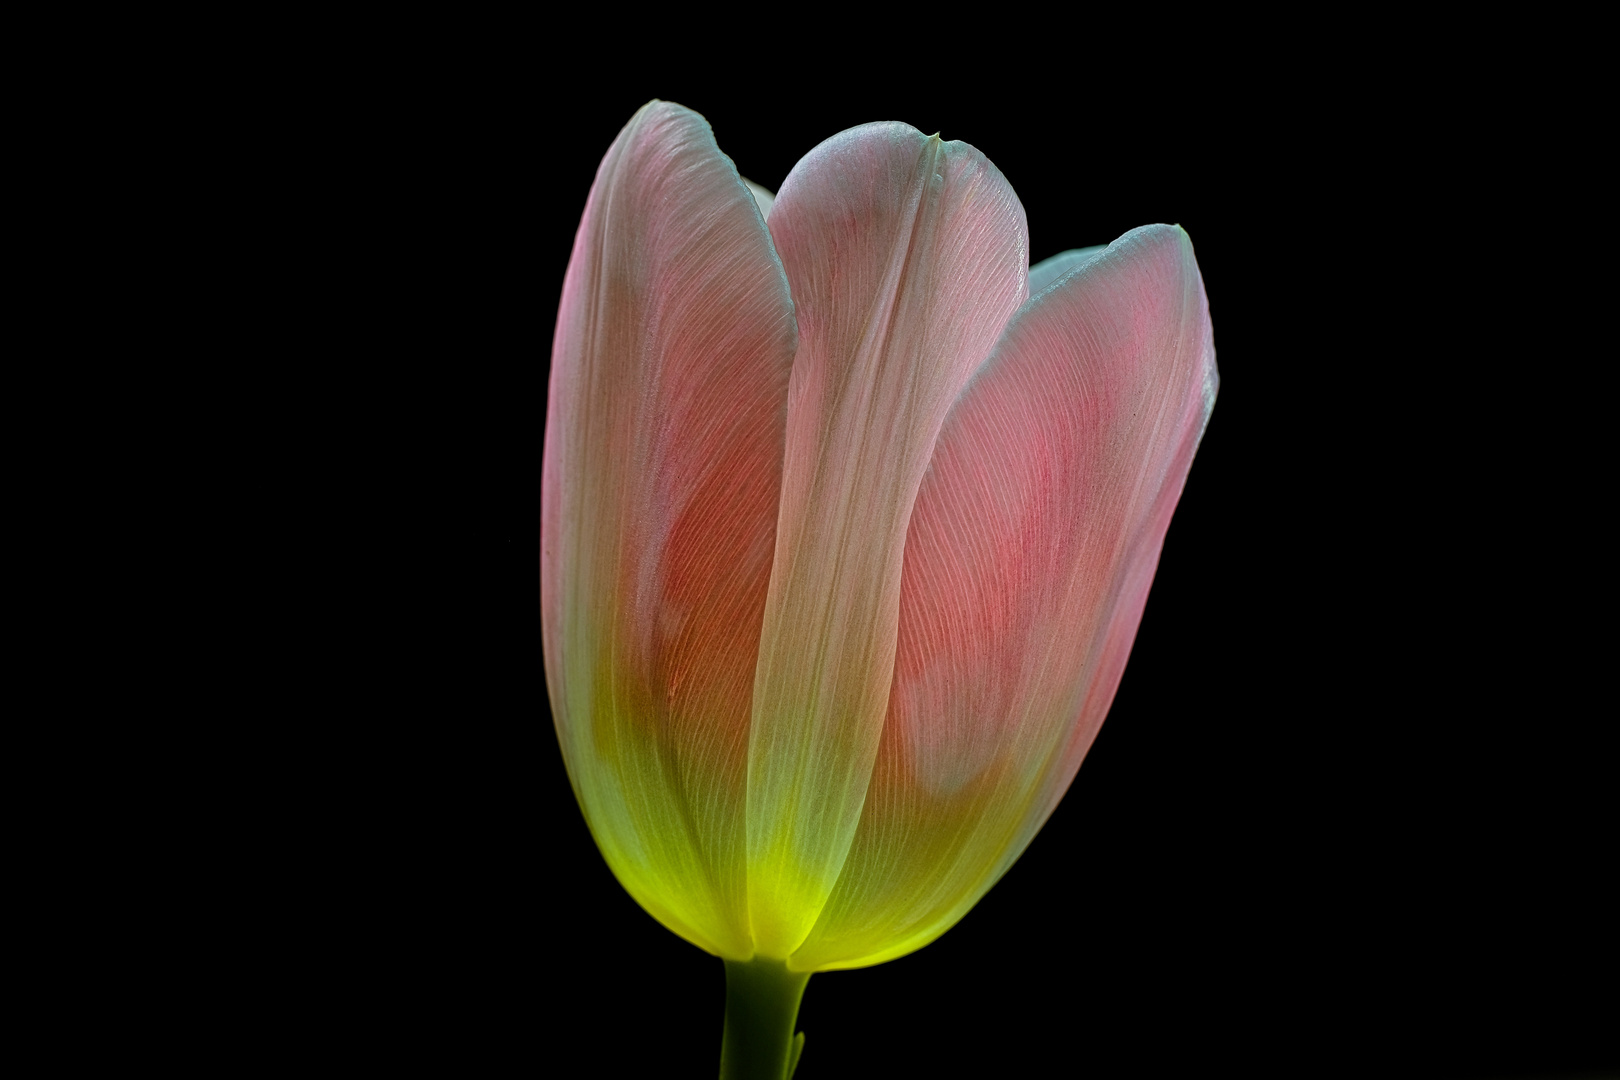 rosa Tulpe